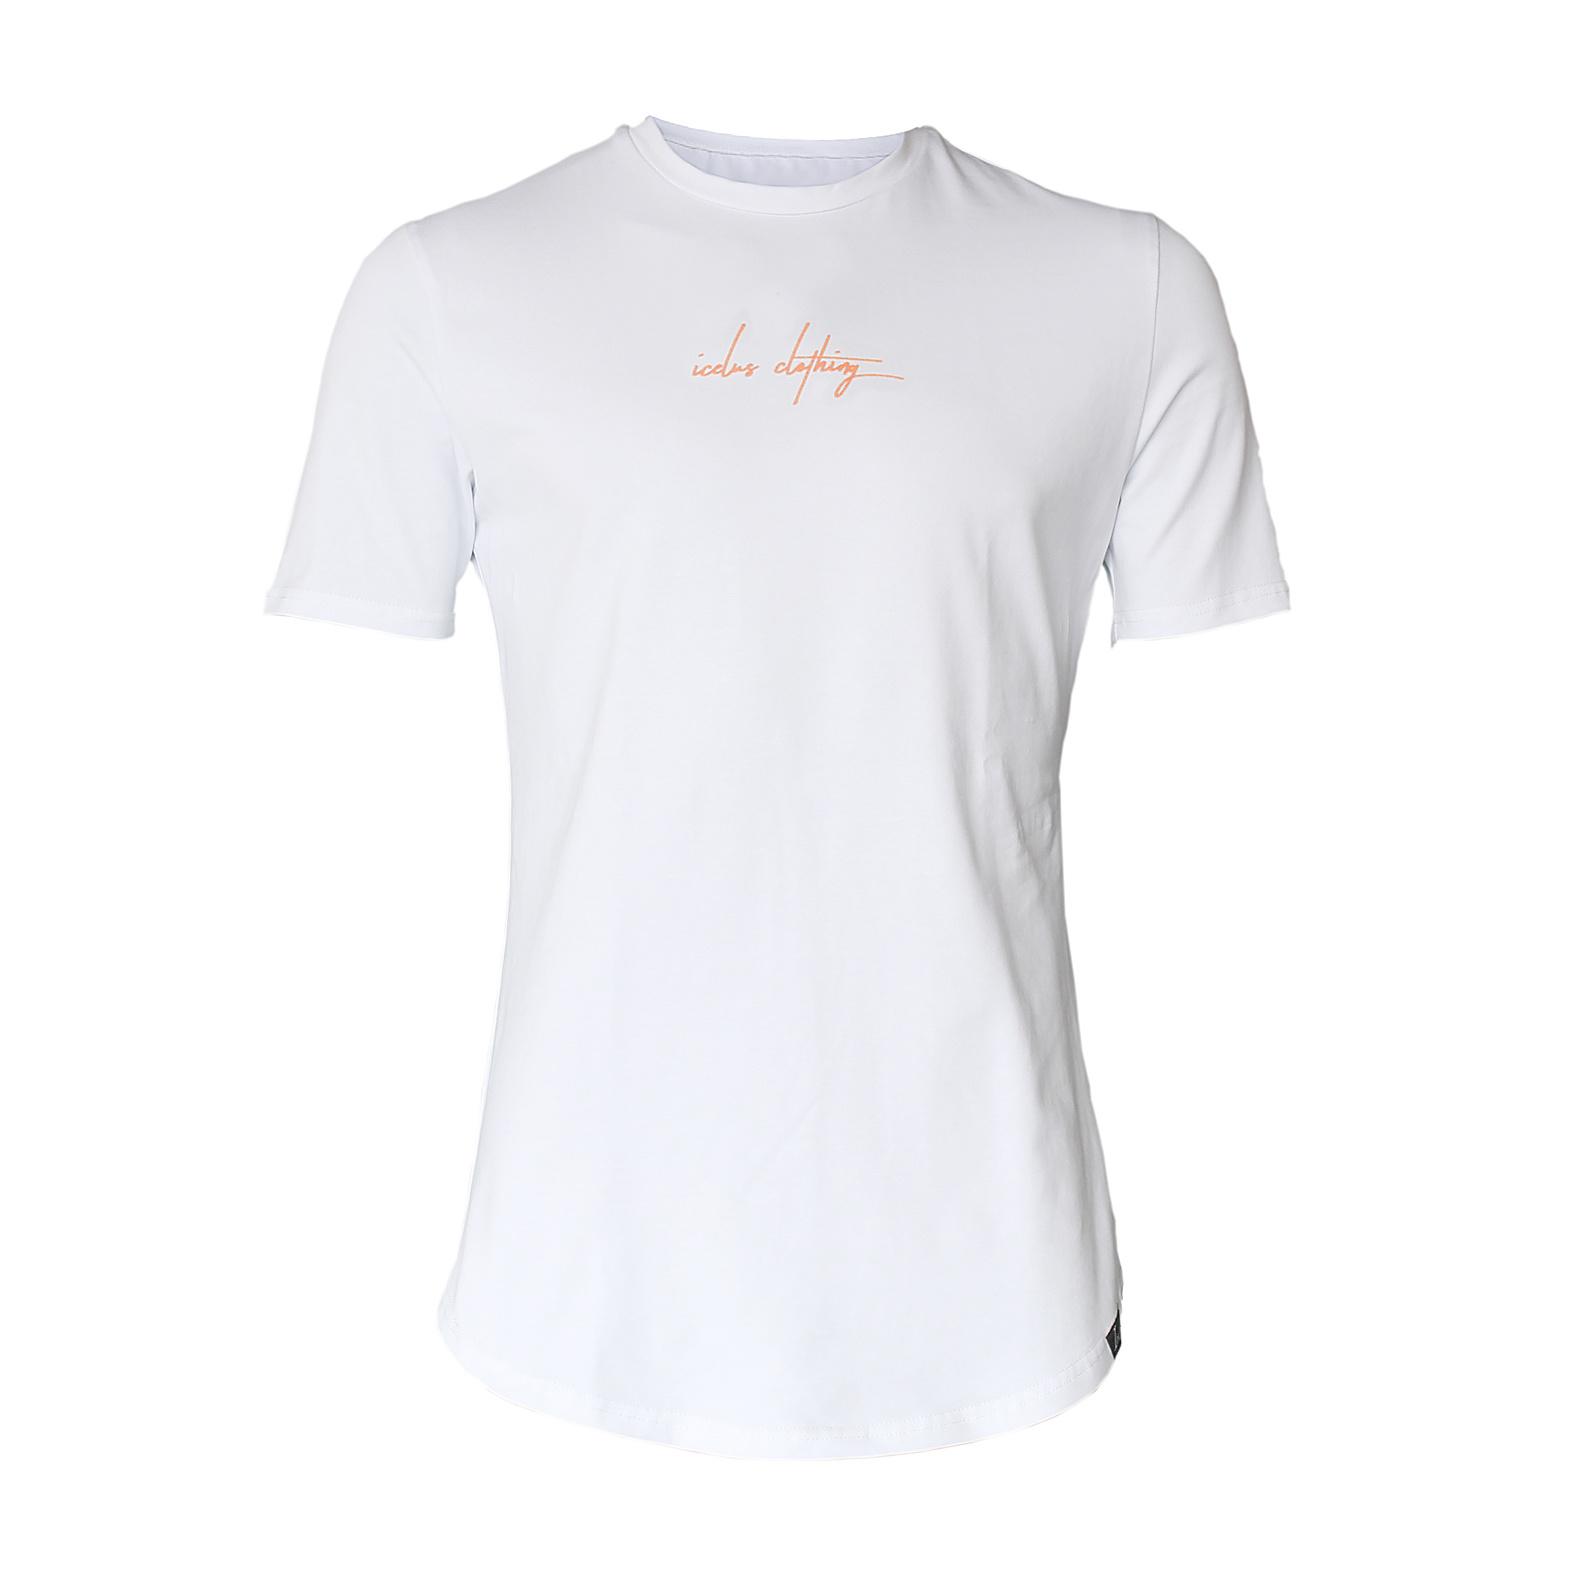 Icelus Clothing Maison Series Orange on White